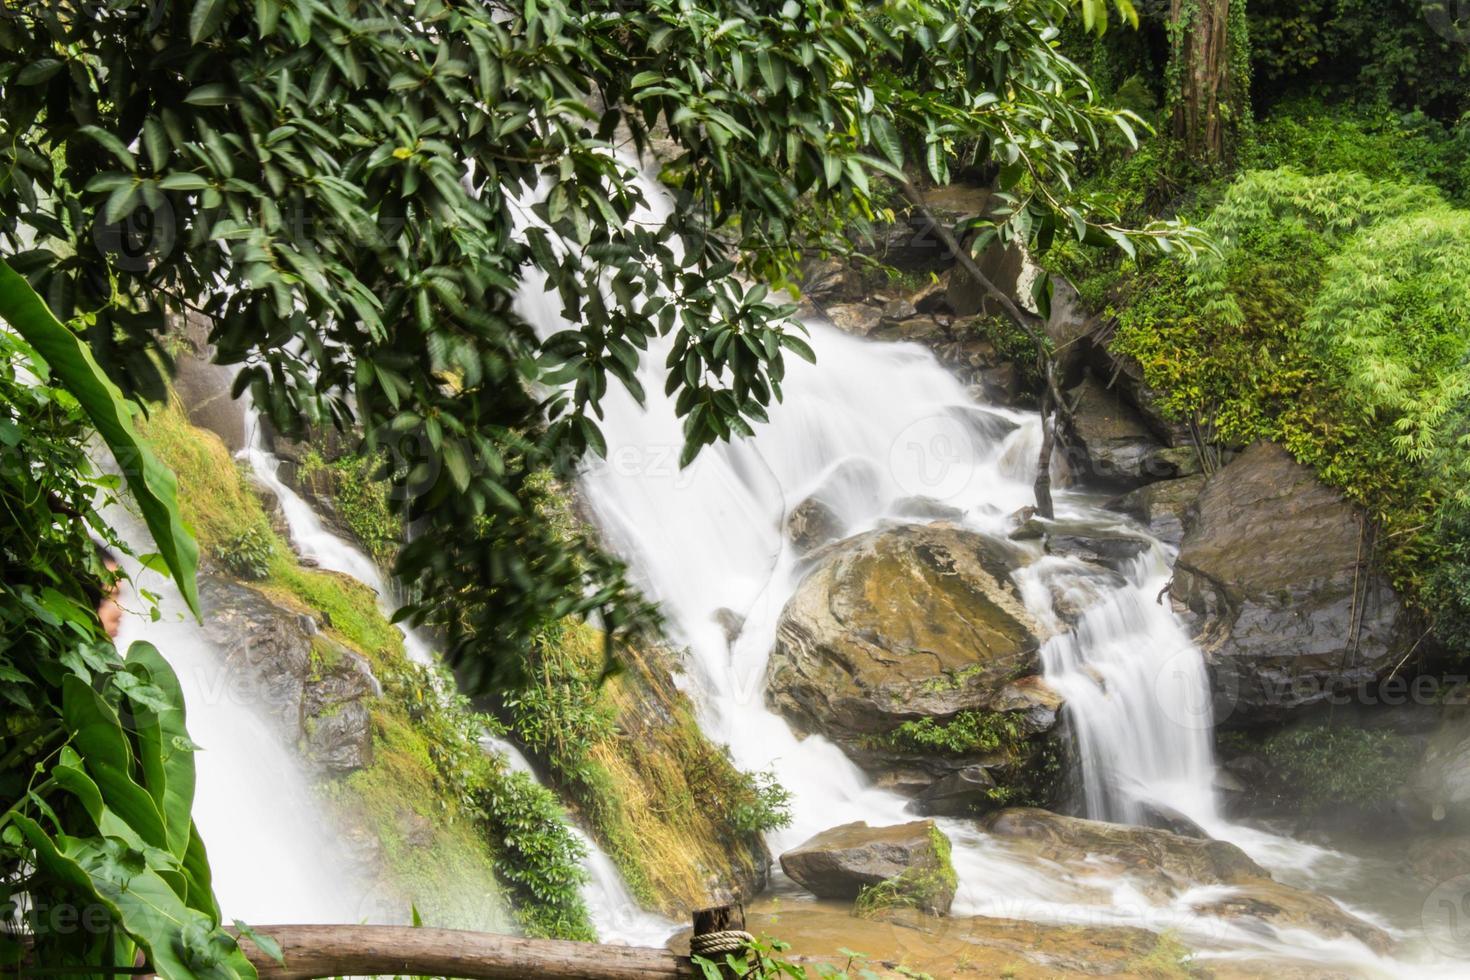 Wachirathan Wasserfälle, Inthanon Chiangmai Thailand foto